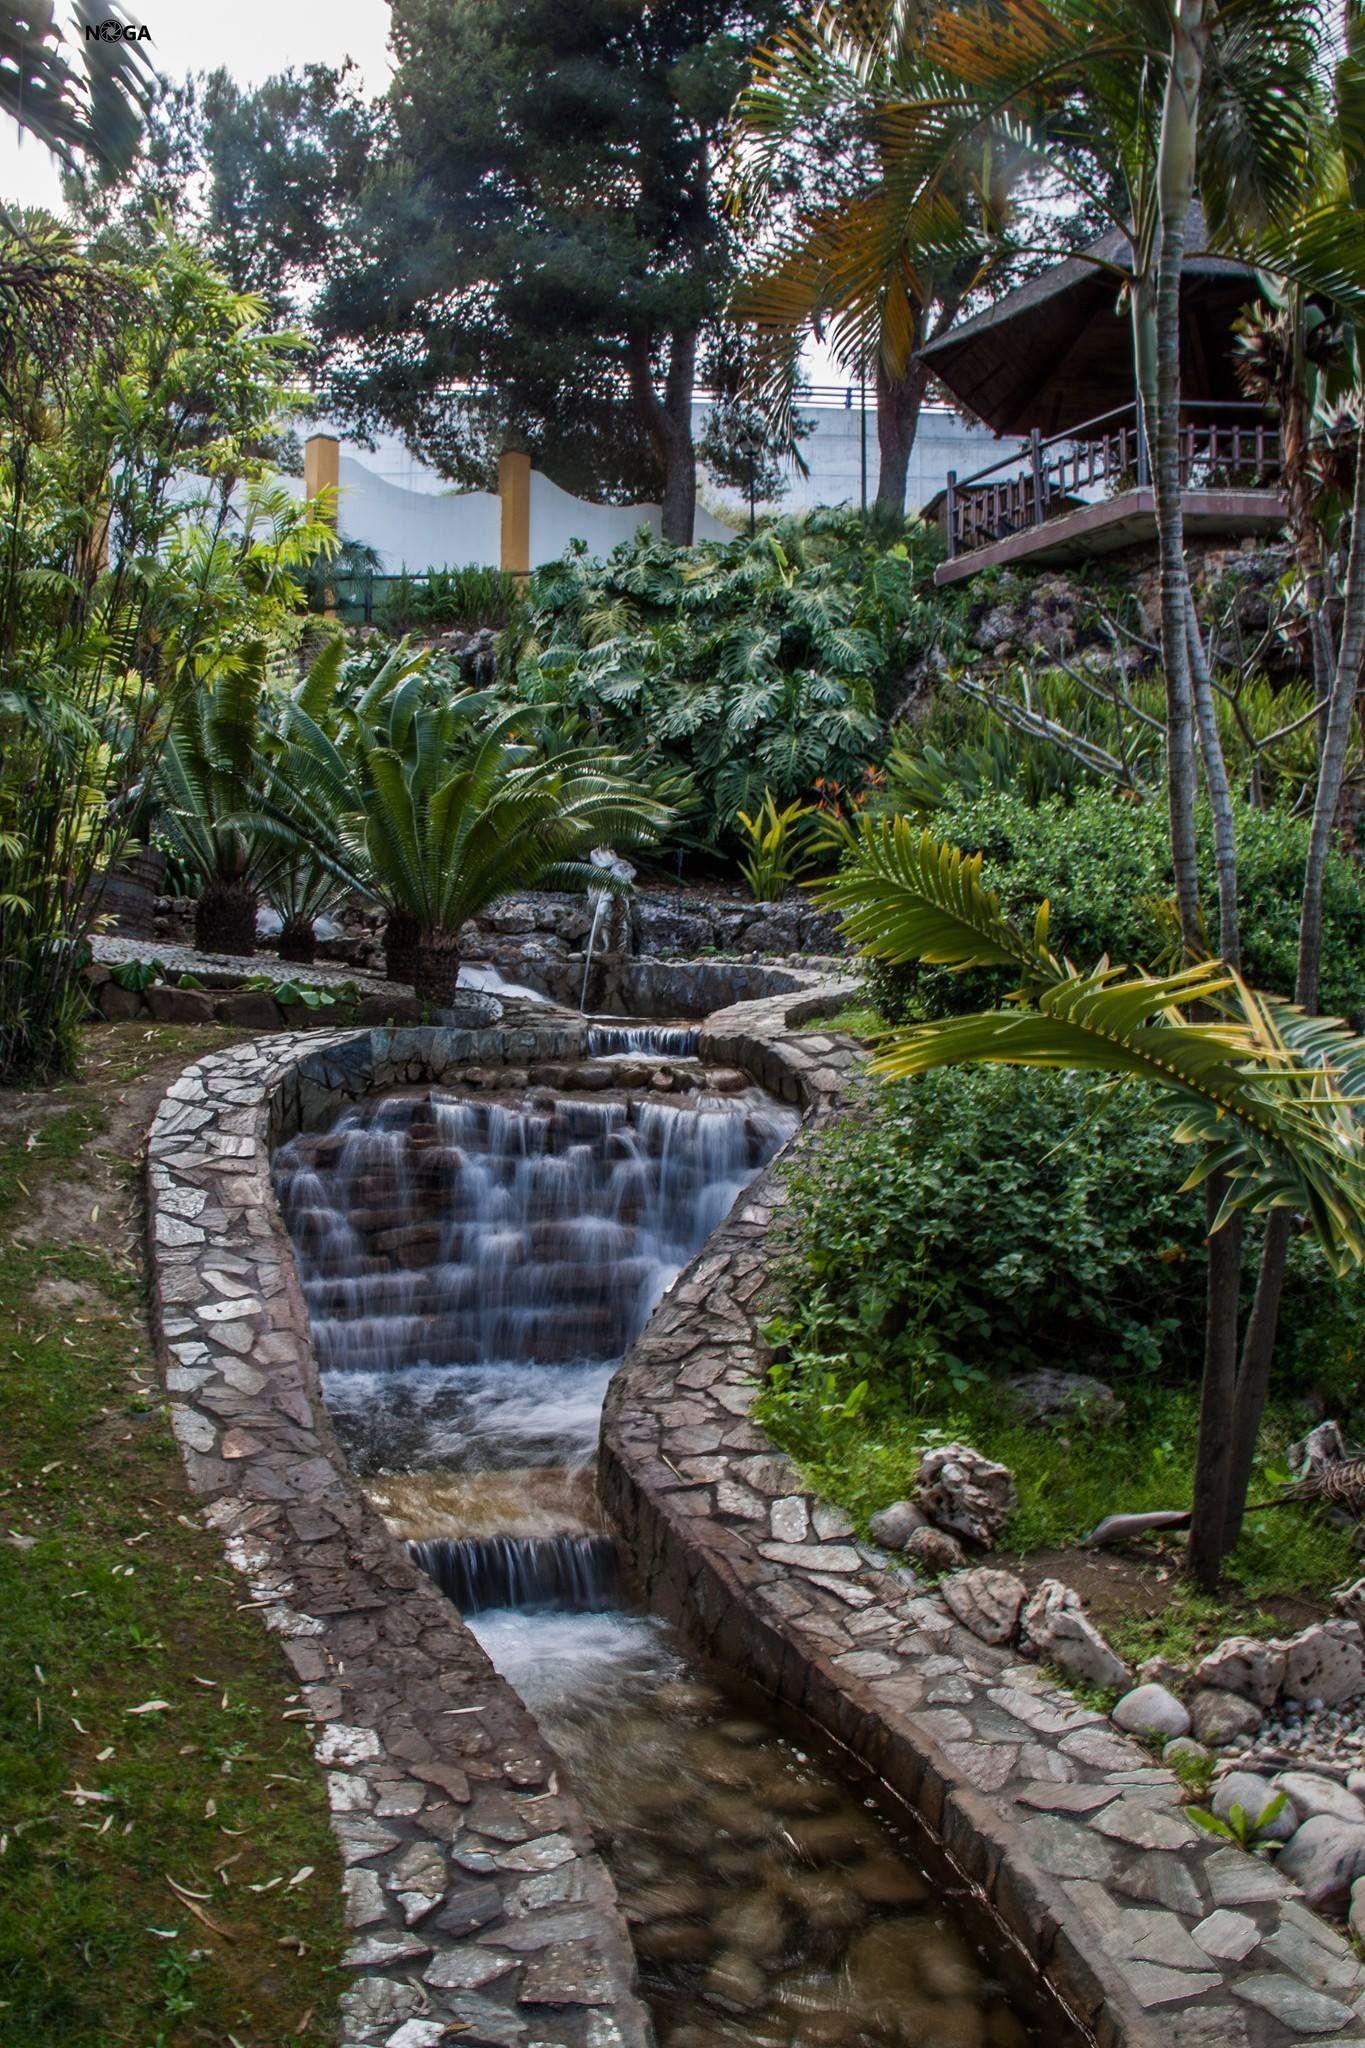 Jard n bot nico molino del inca torremolinos m laga for Jardin botanico torremolinos